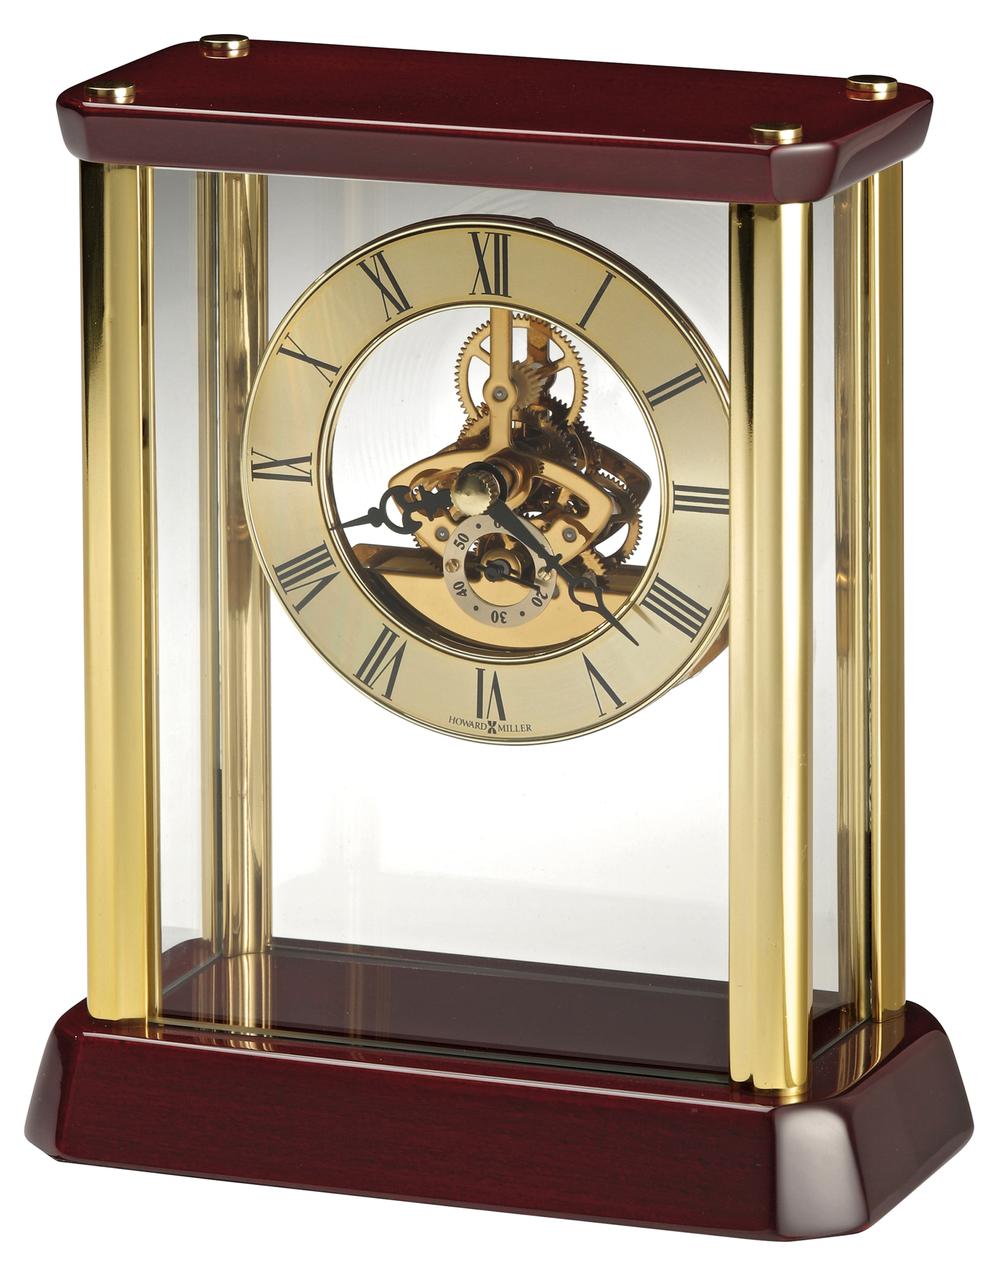 Howard Miller Clock - Kingston Table Top Clock